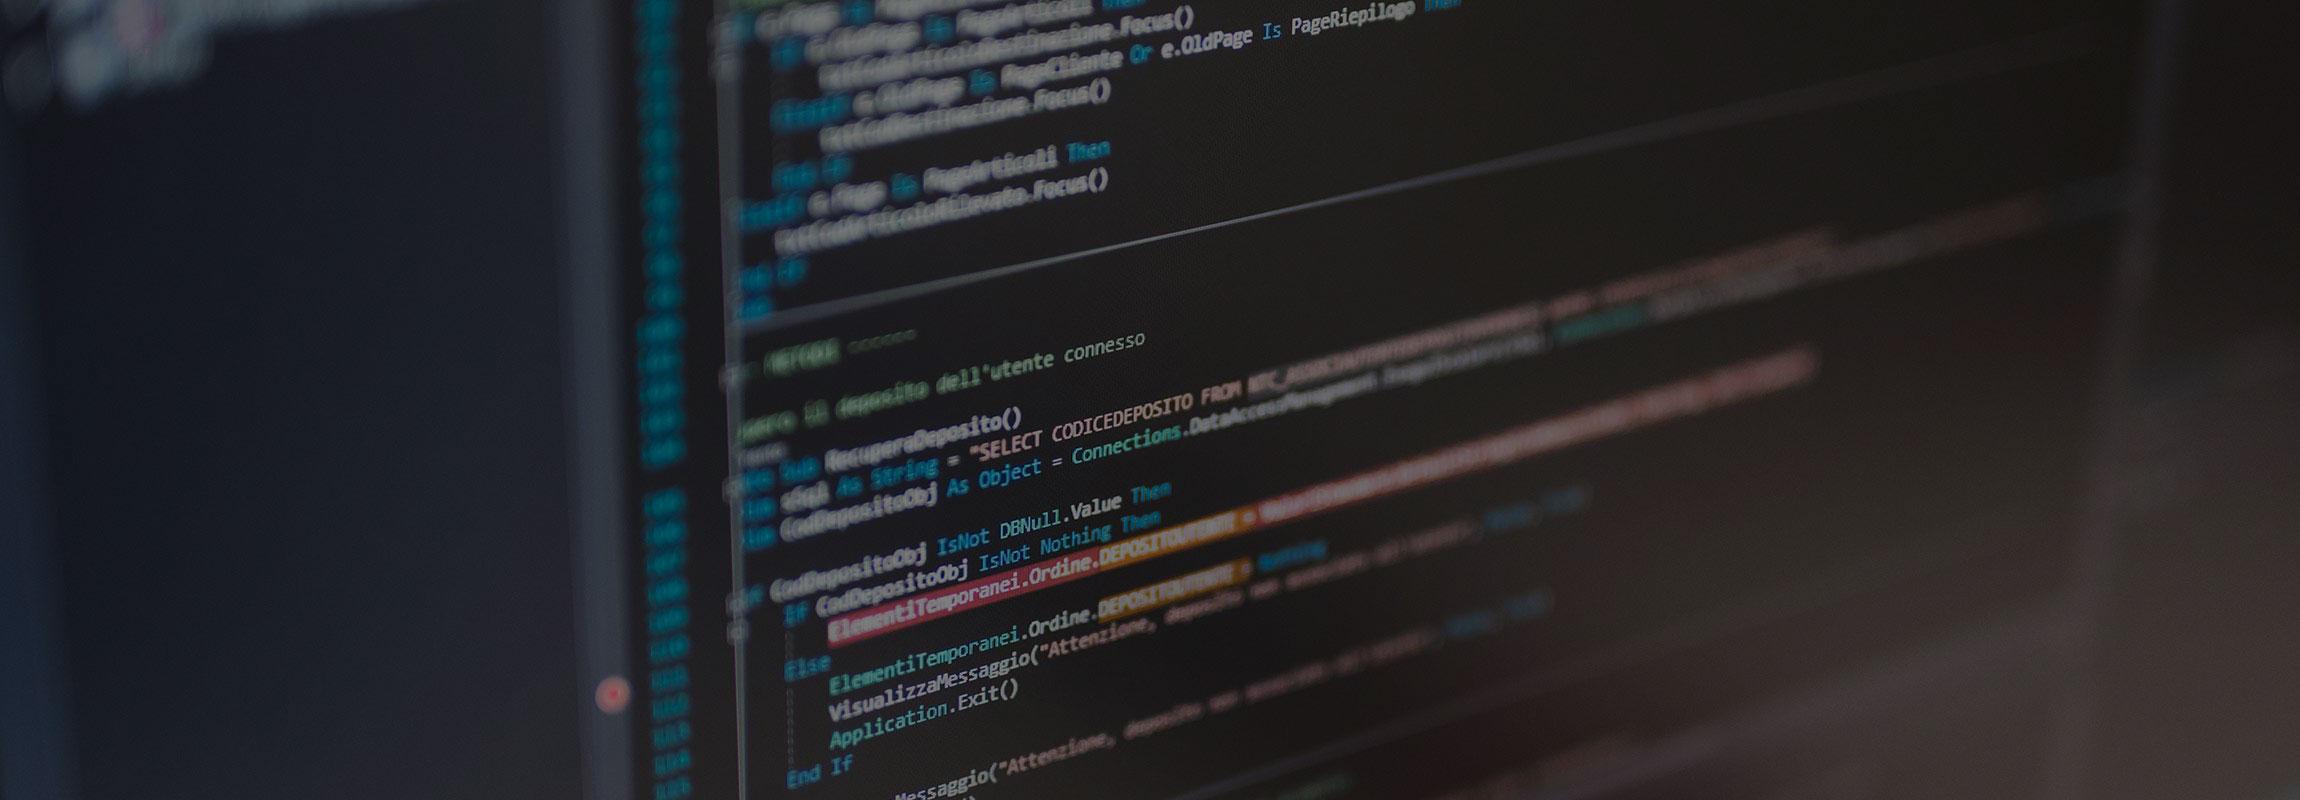 Ntc-informatica-sviluppo-software-gestionale-verona-slide-02